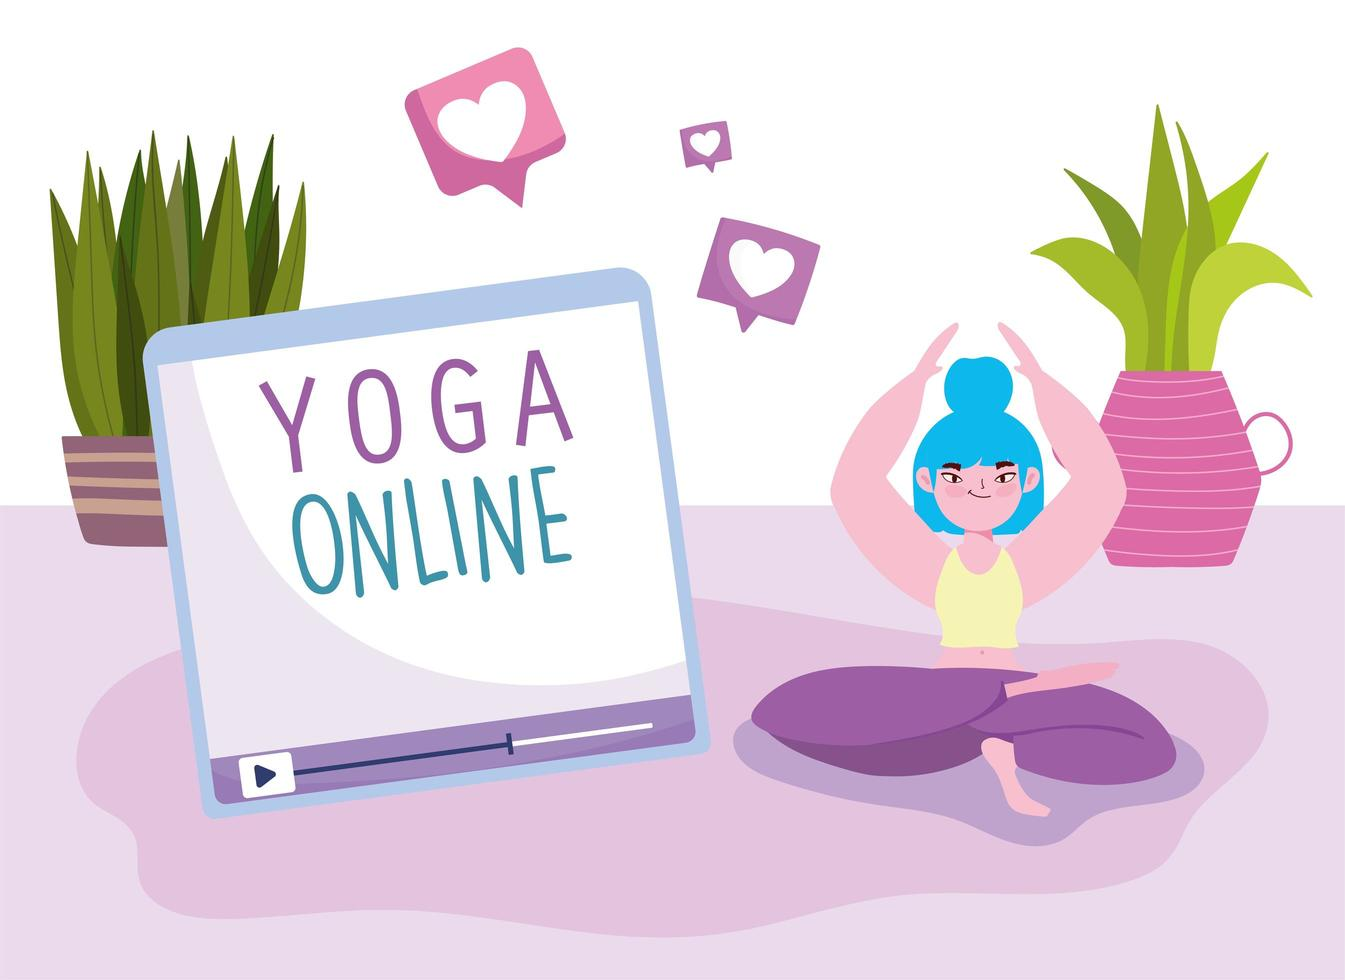 junge Frau, die Yoga online in Lotushaltung praktiziert vektor